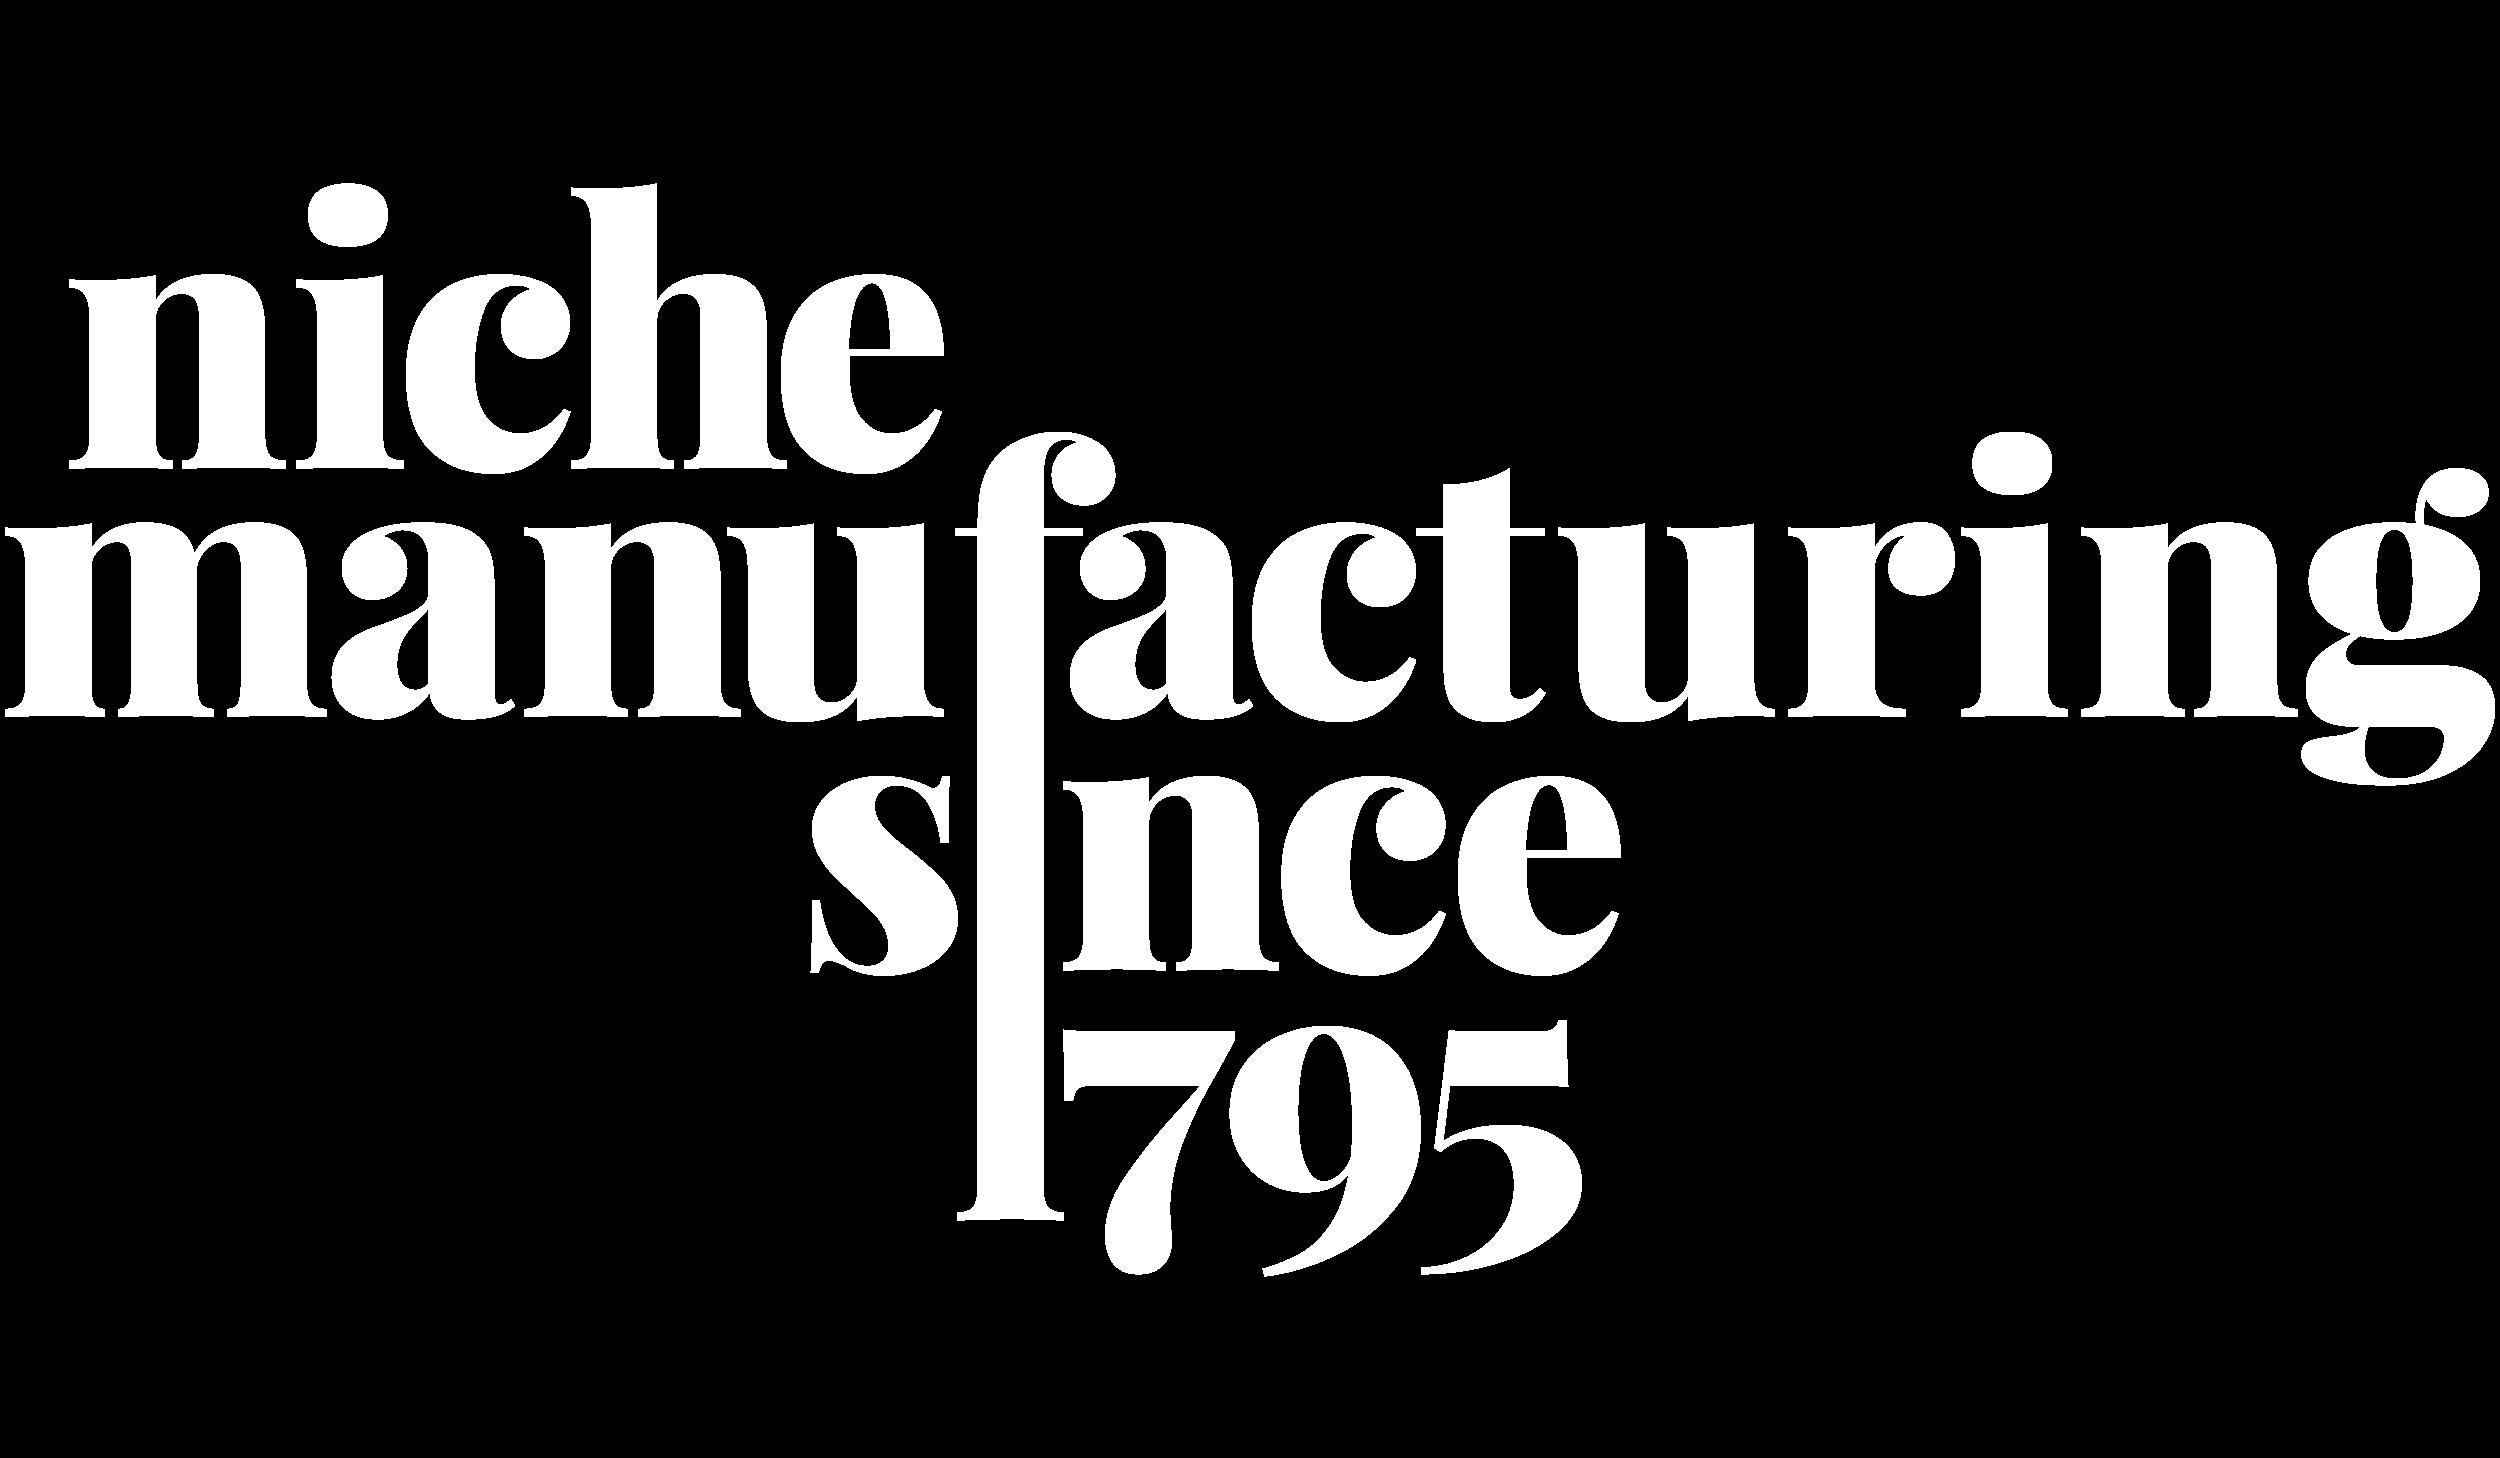 Niche Manufacturing since 1795